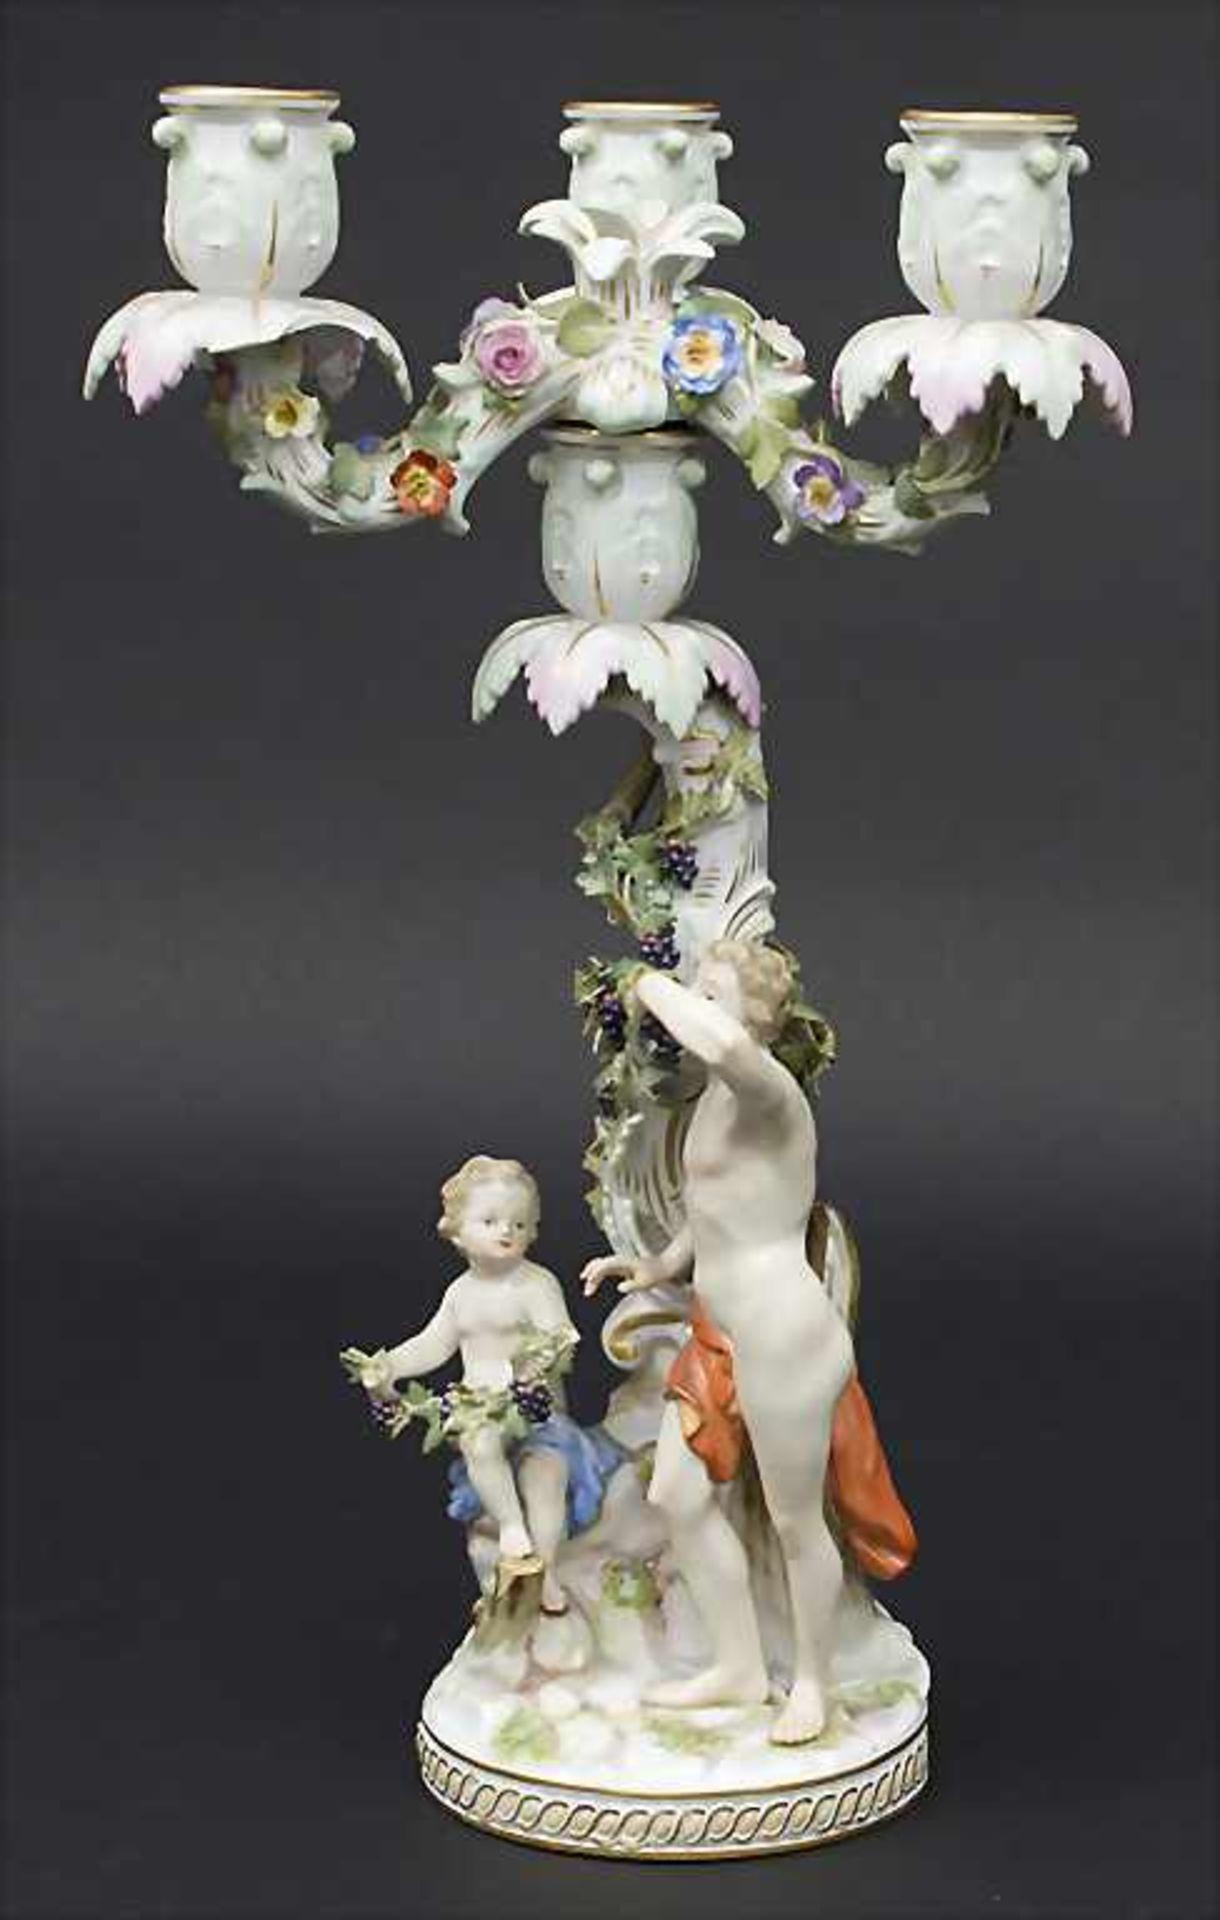 Dreiflammiger Leuchter Allegorie 'Der Herbst' / An allegorical candleholder 'The Autumn', Meissen, - Bild 2 aus 9